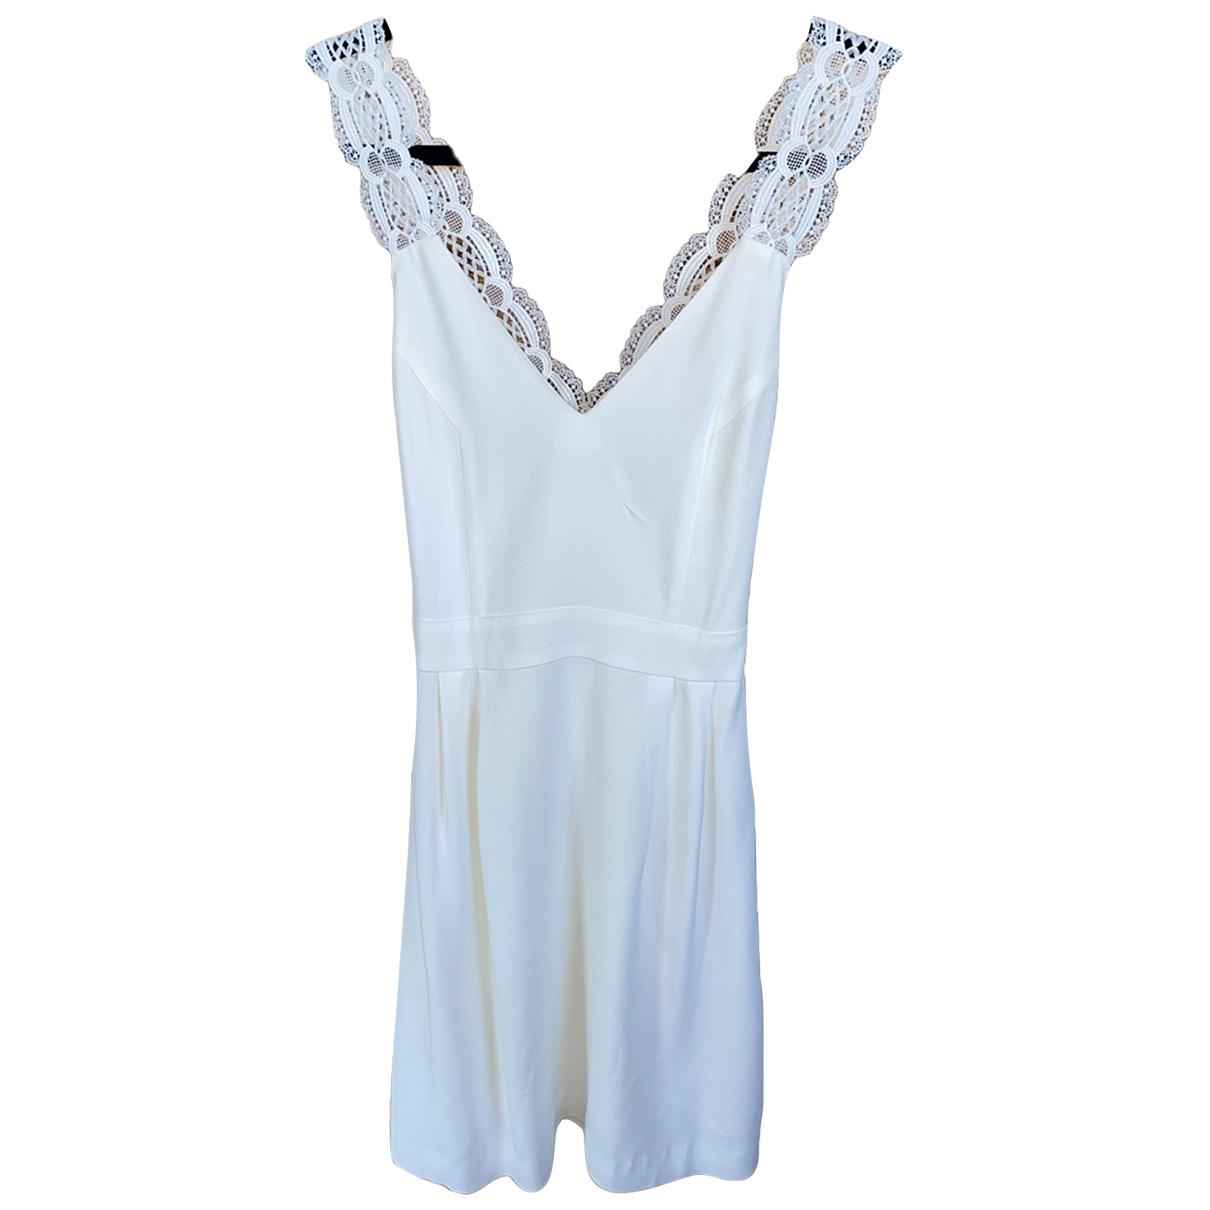 Sézane Spring Summer 2019 White Lace dress for Women 34 FR